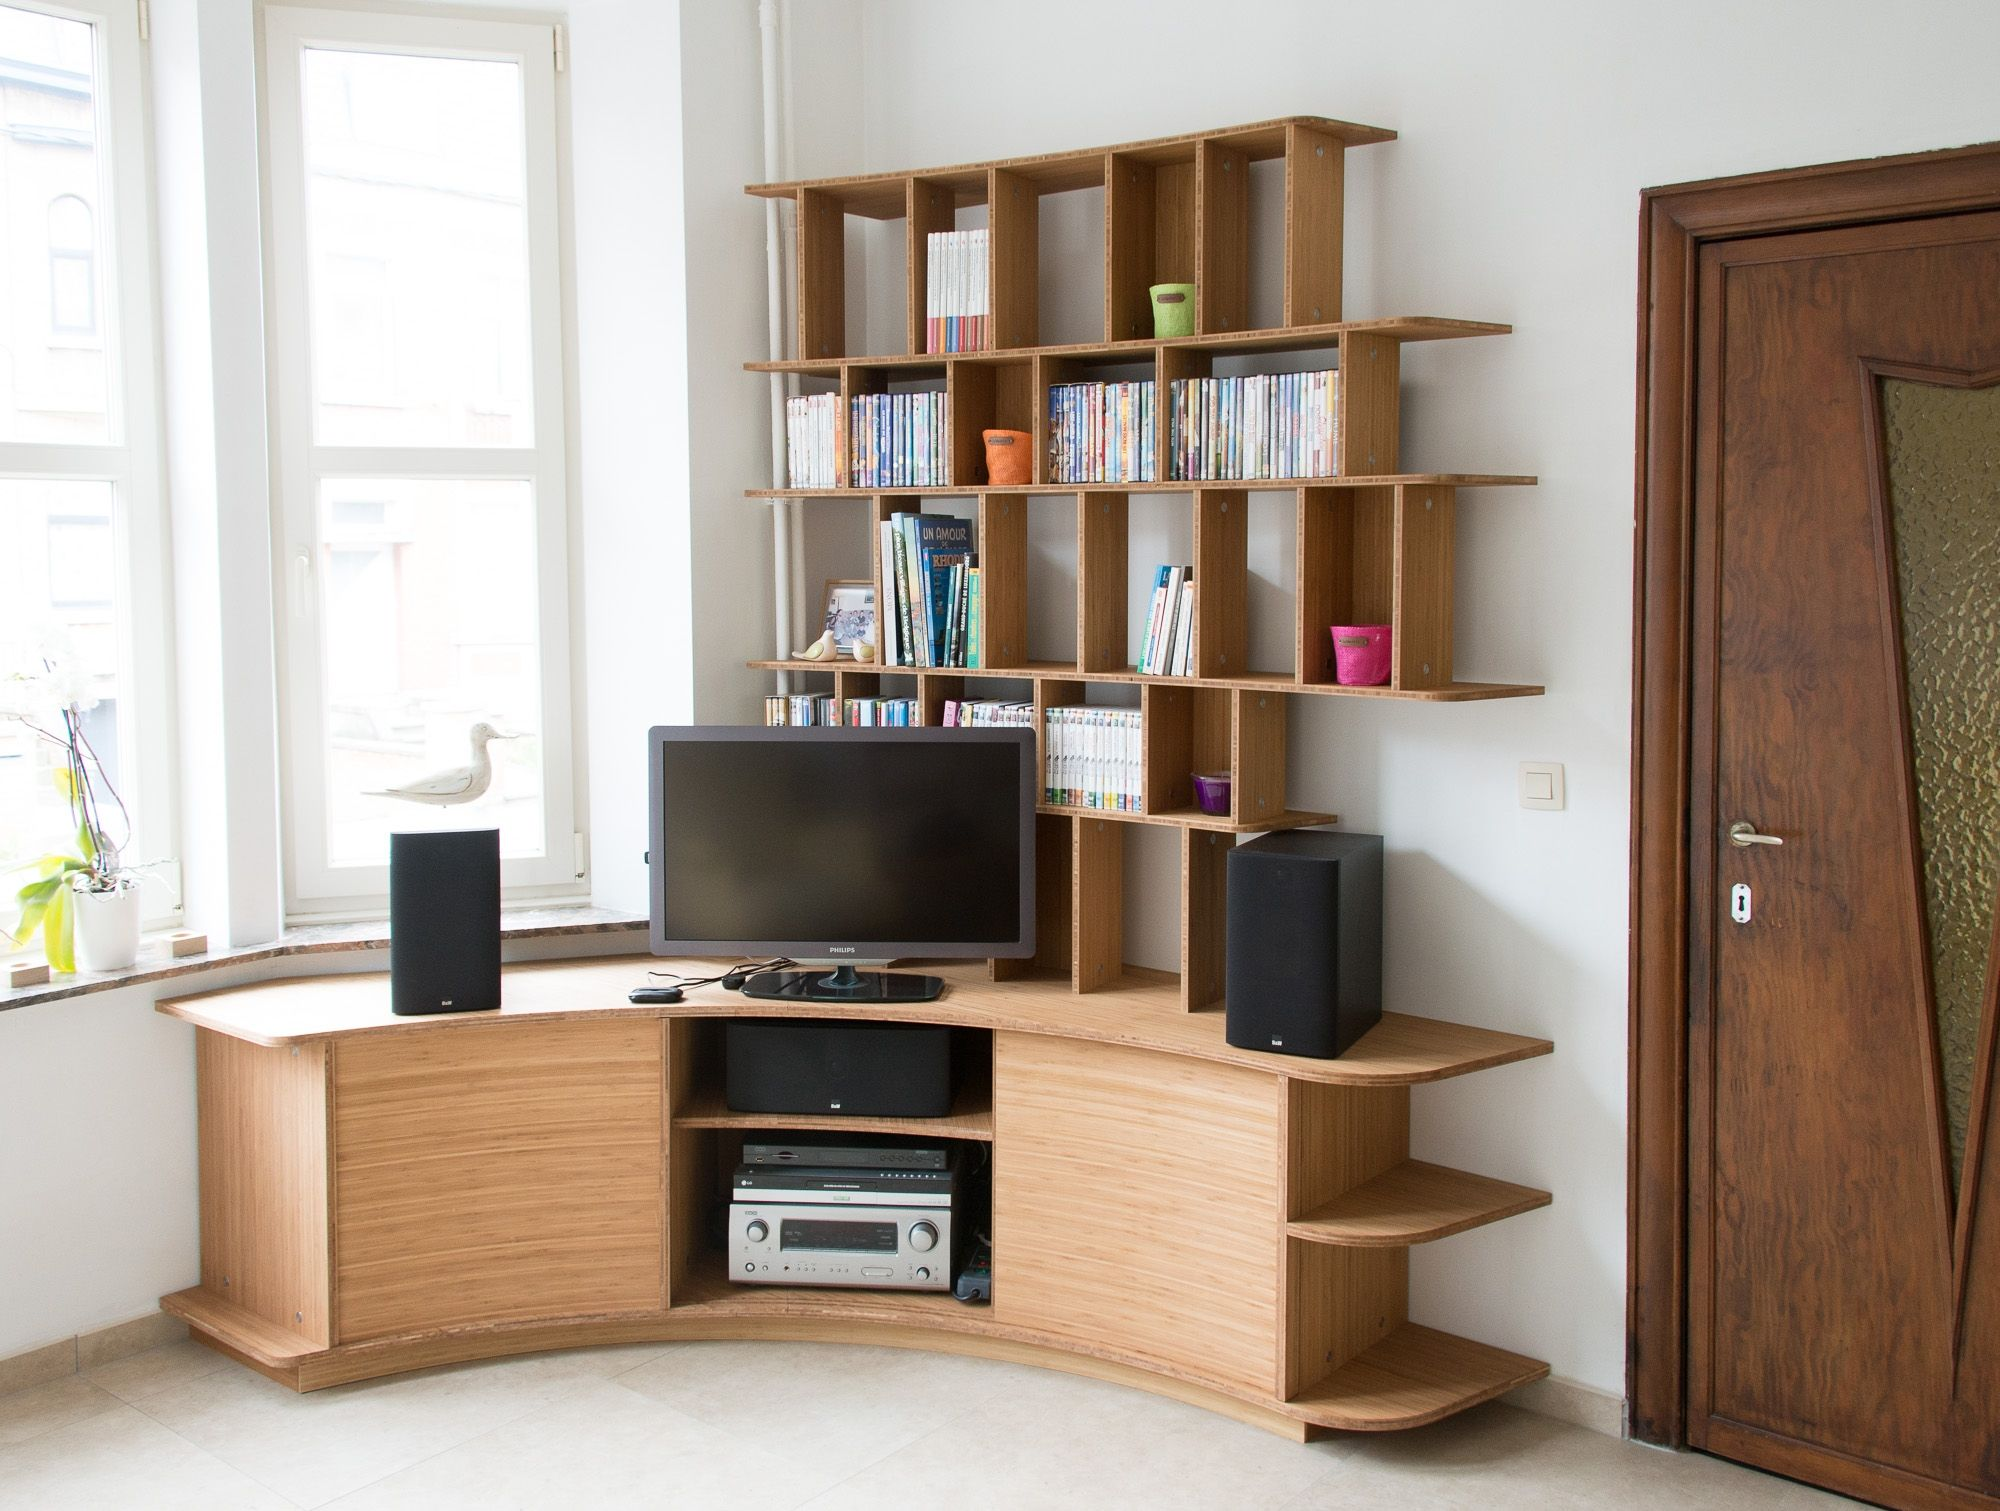 custom made tv stand and bookshelf in philippes living room meuble tv et tagre sur - Meuble Tv Made In Design